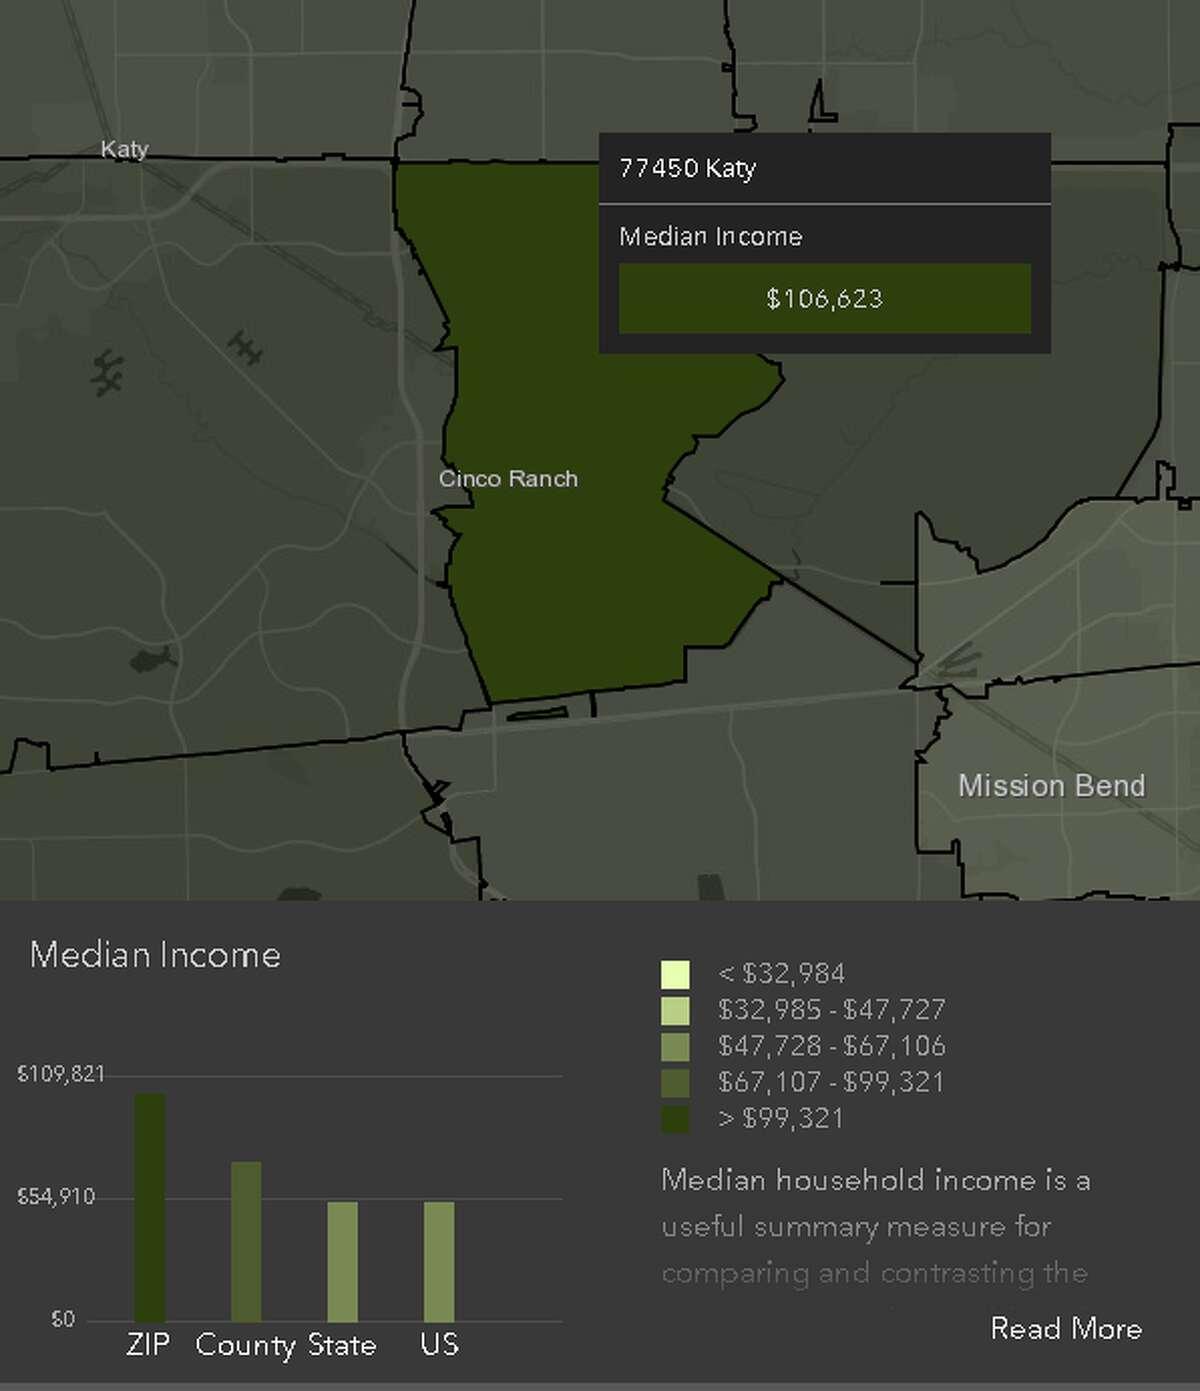 Katy, 77450Median income: $106,623